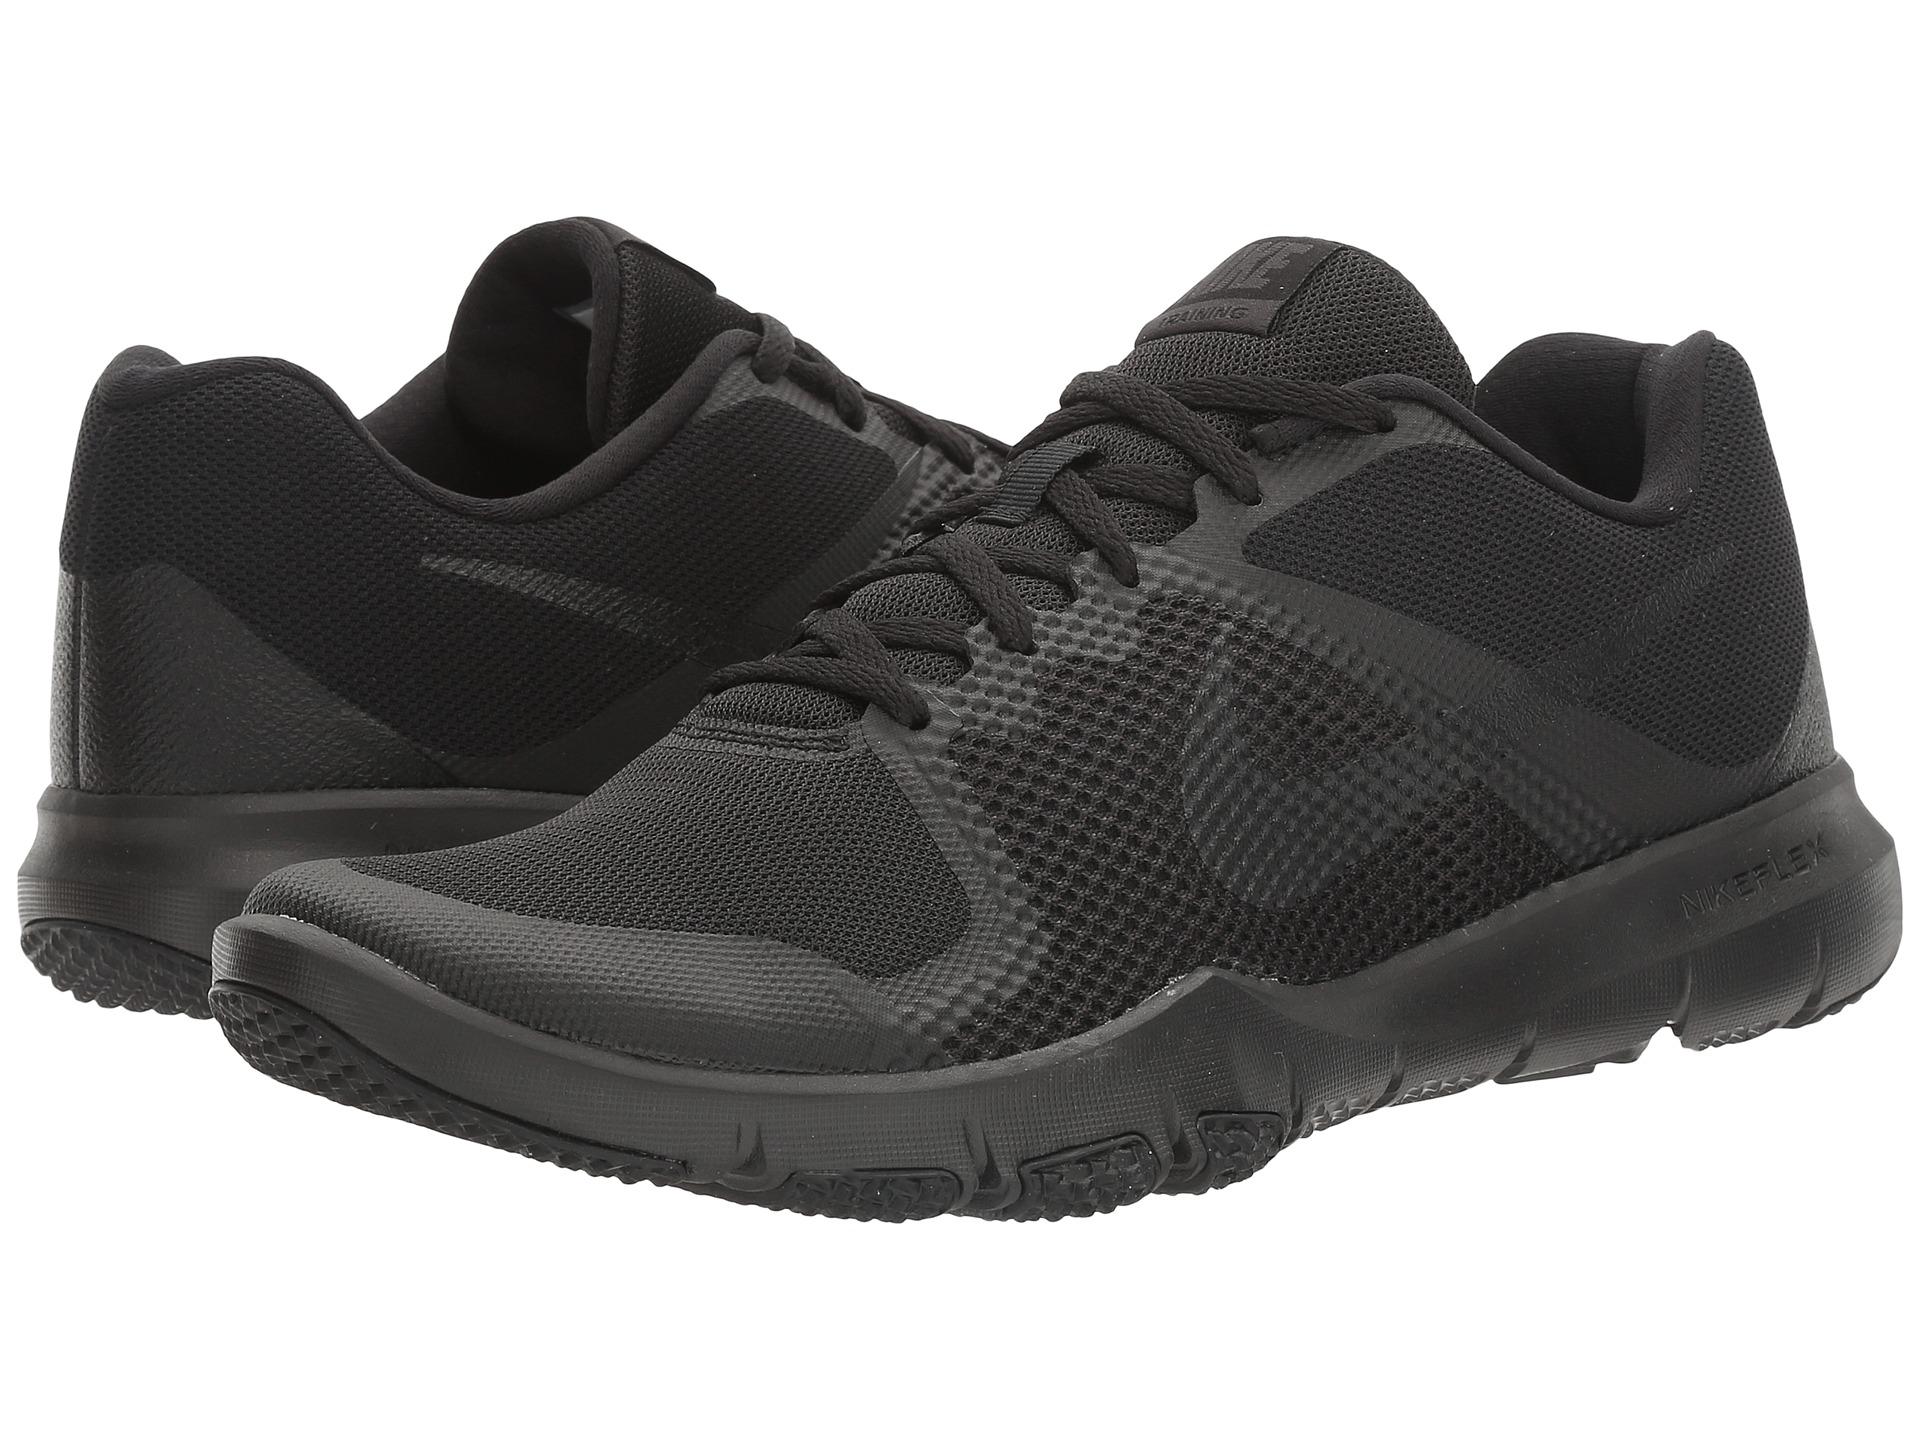 Nike Flex Control Shoes